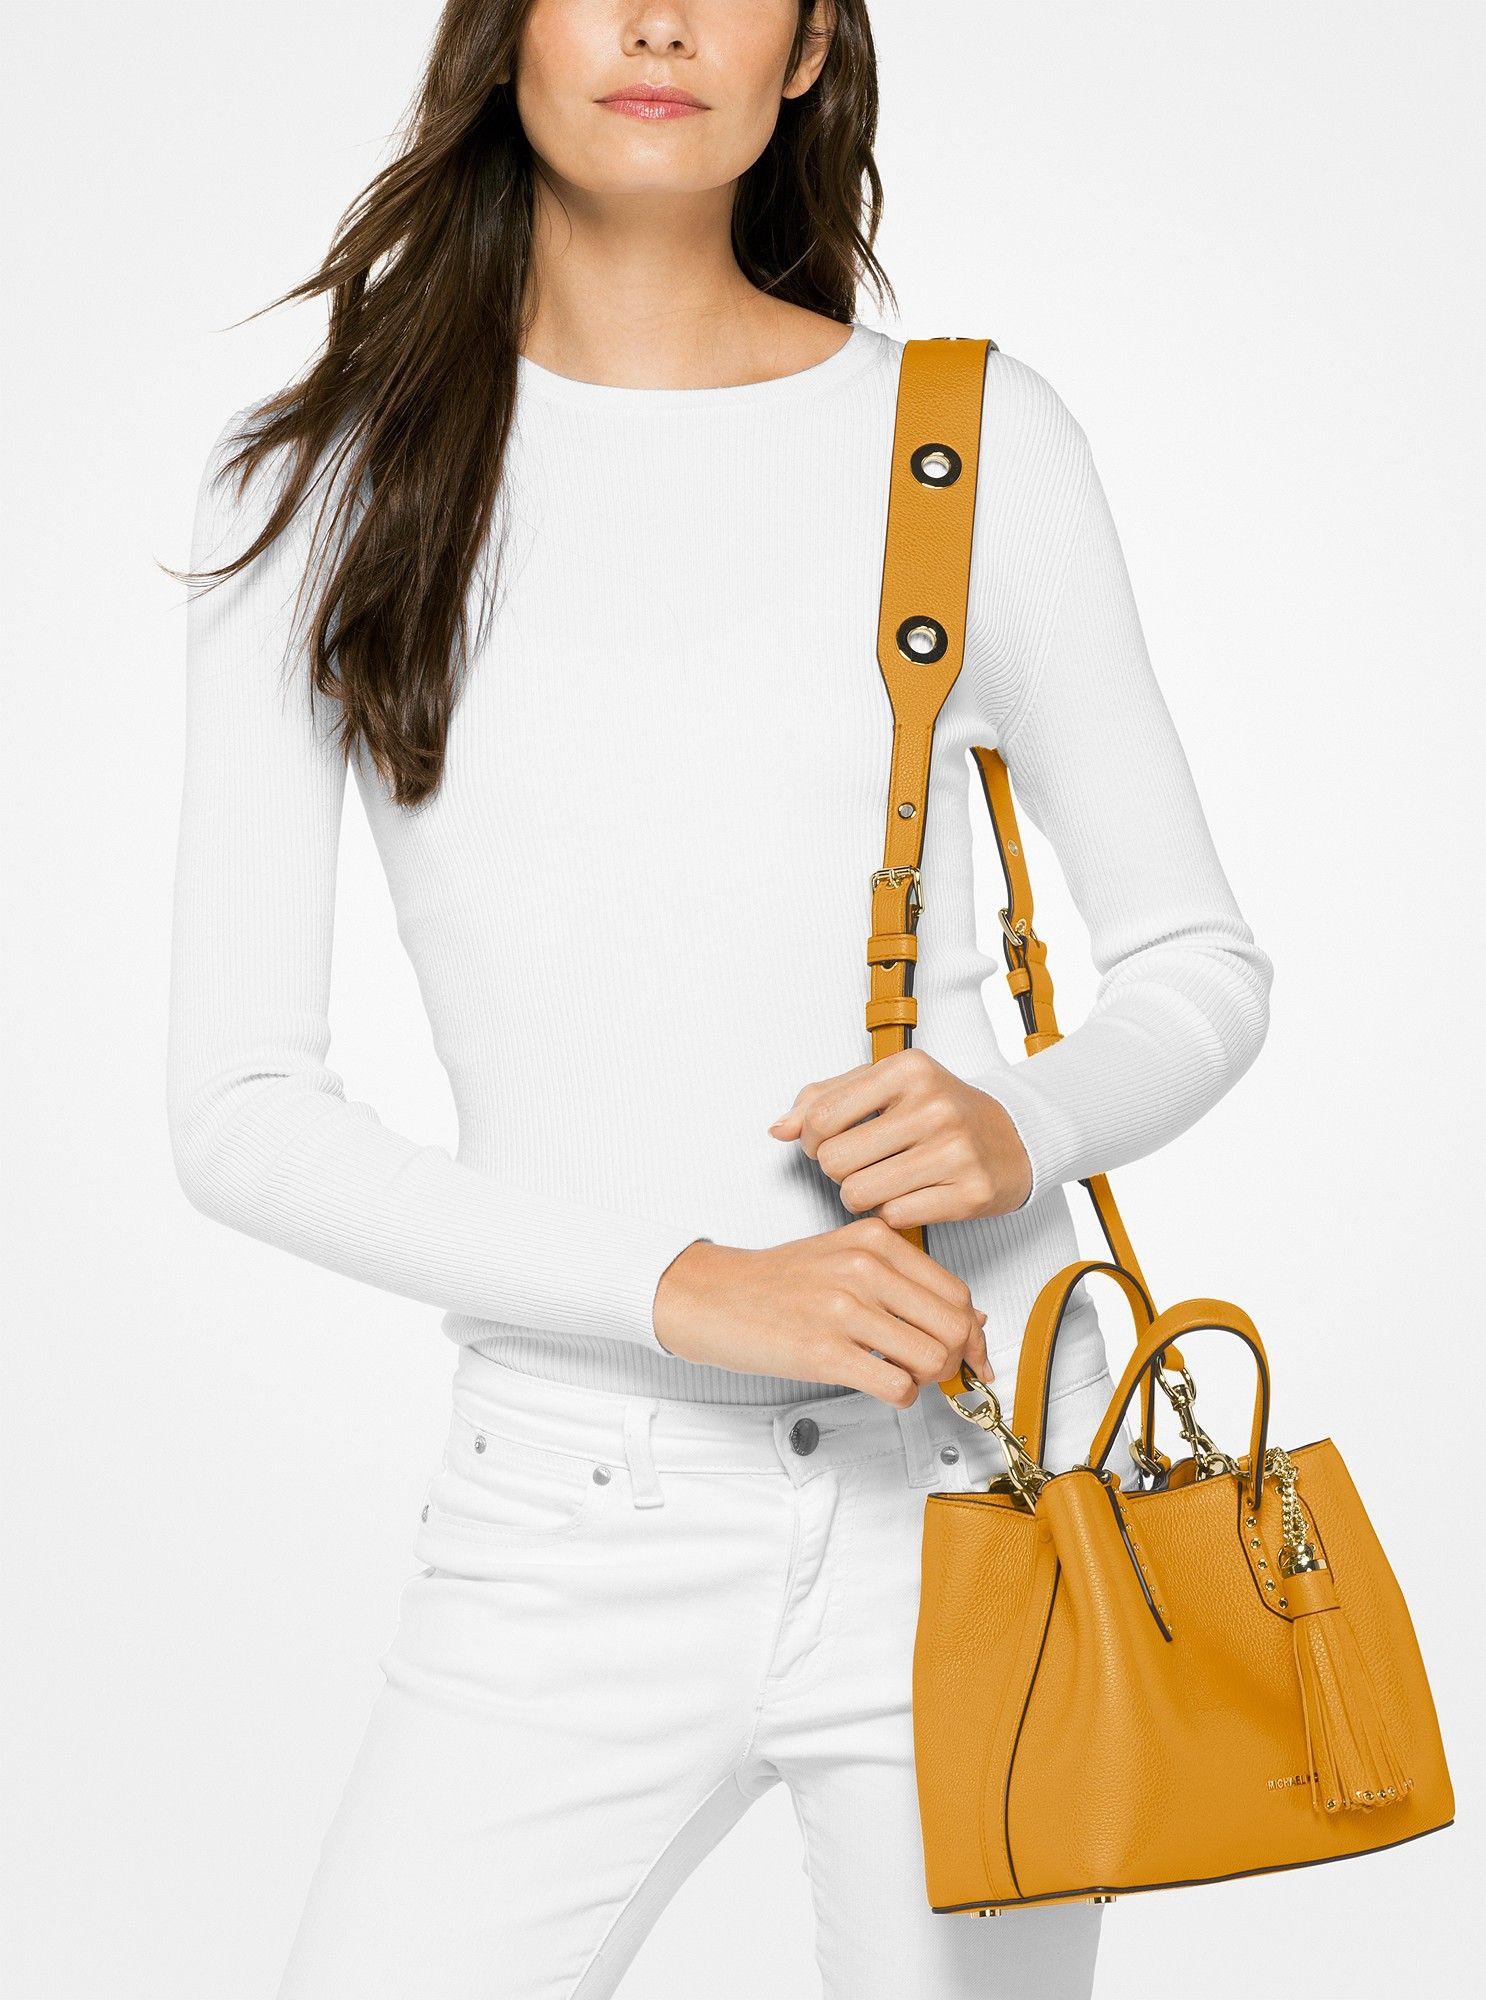 3221f71f83a2 Michael Kors Brooklyn Small Leather Satchel - Marigold | Products ...